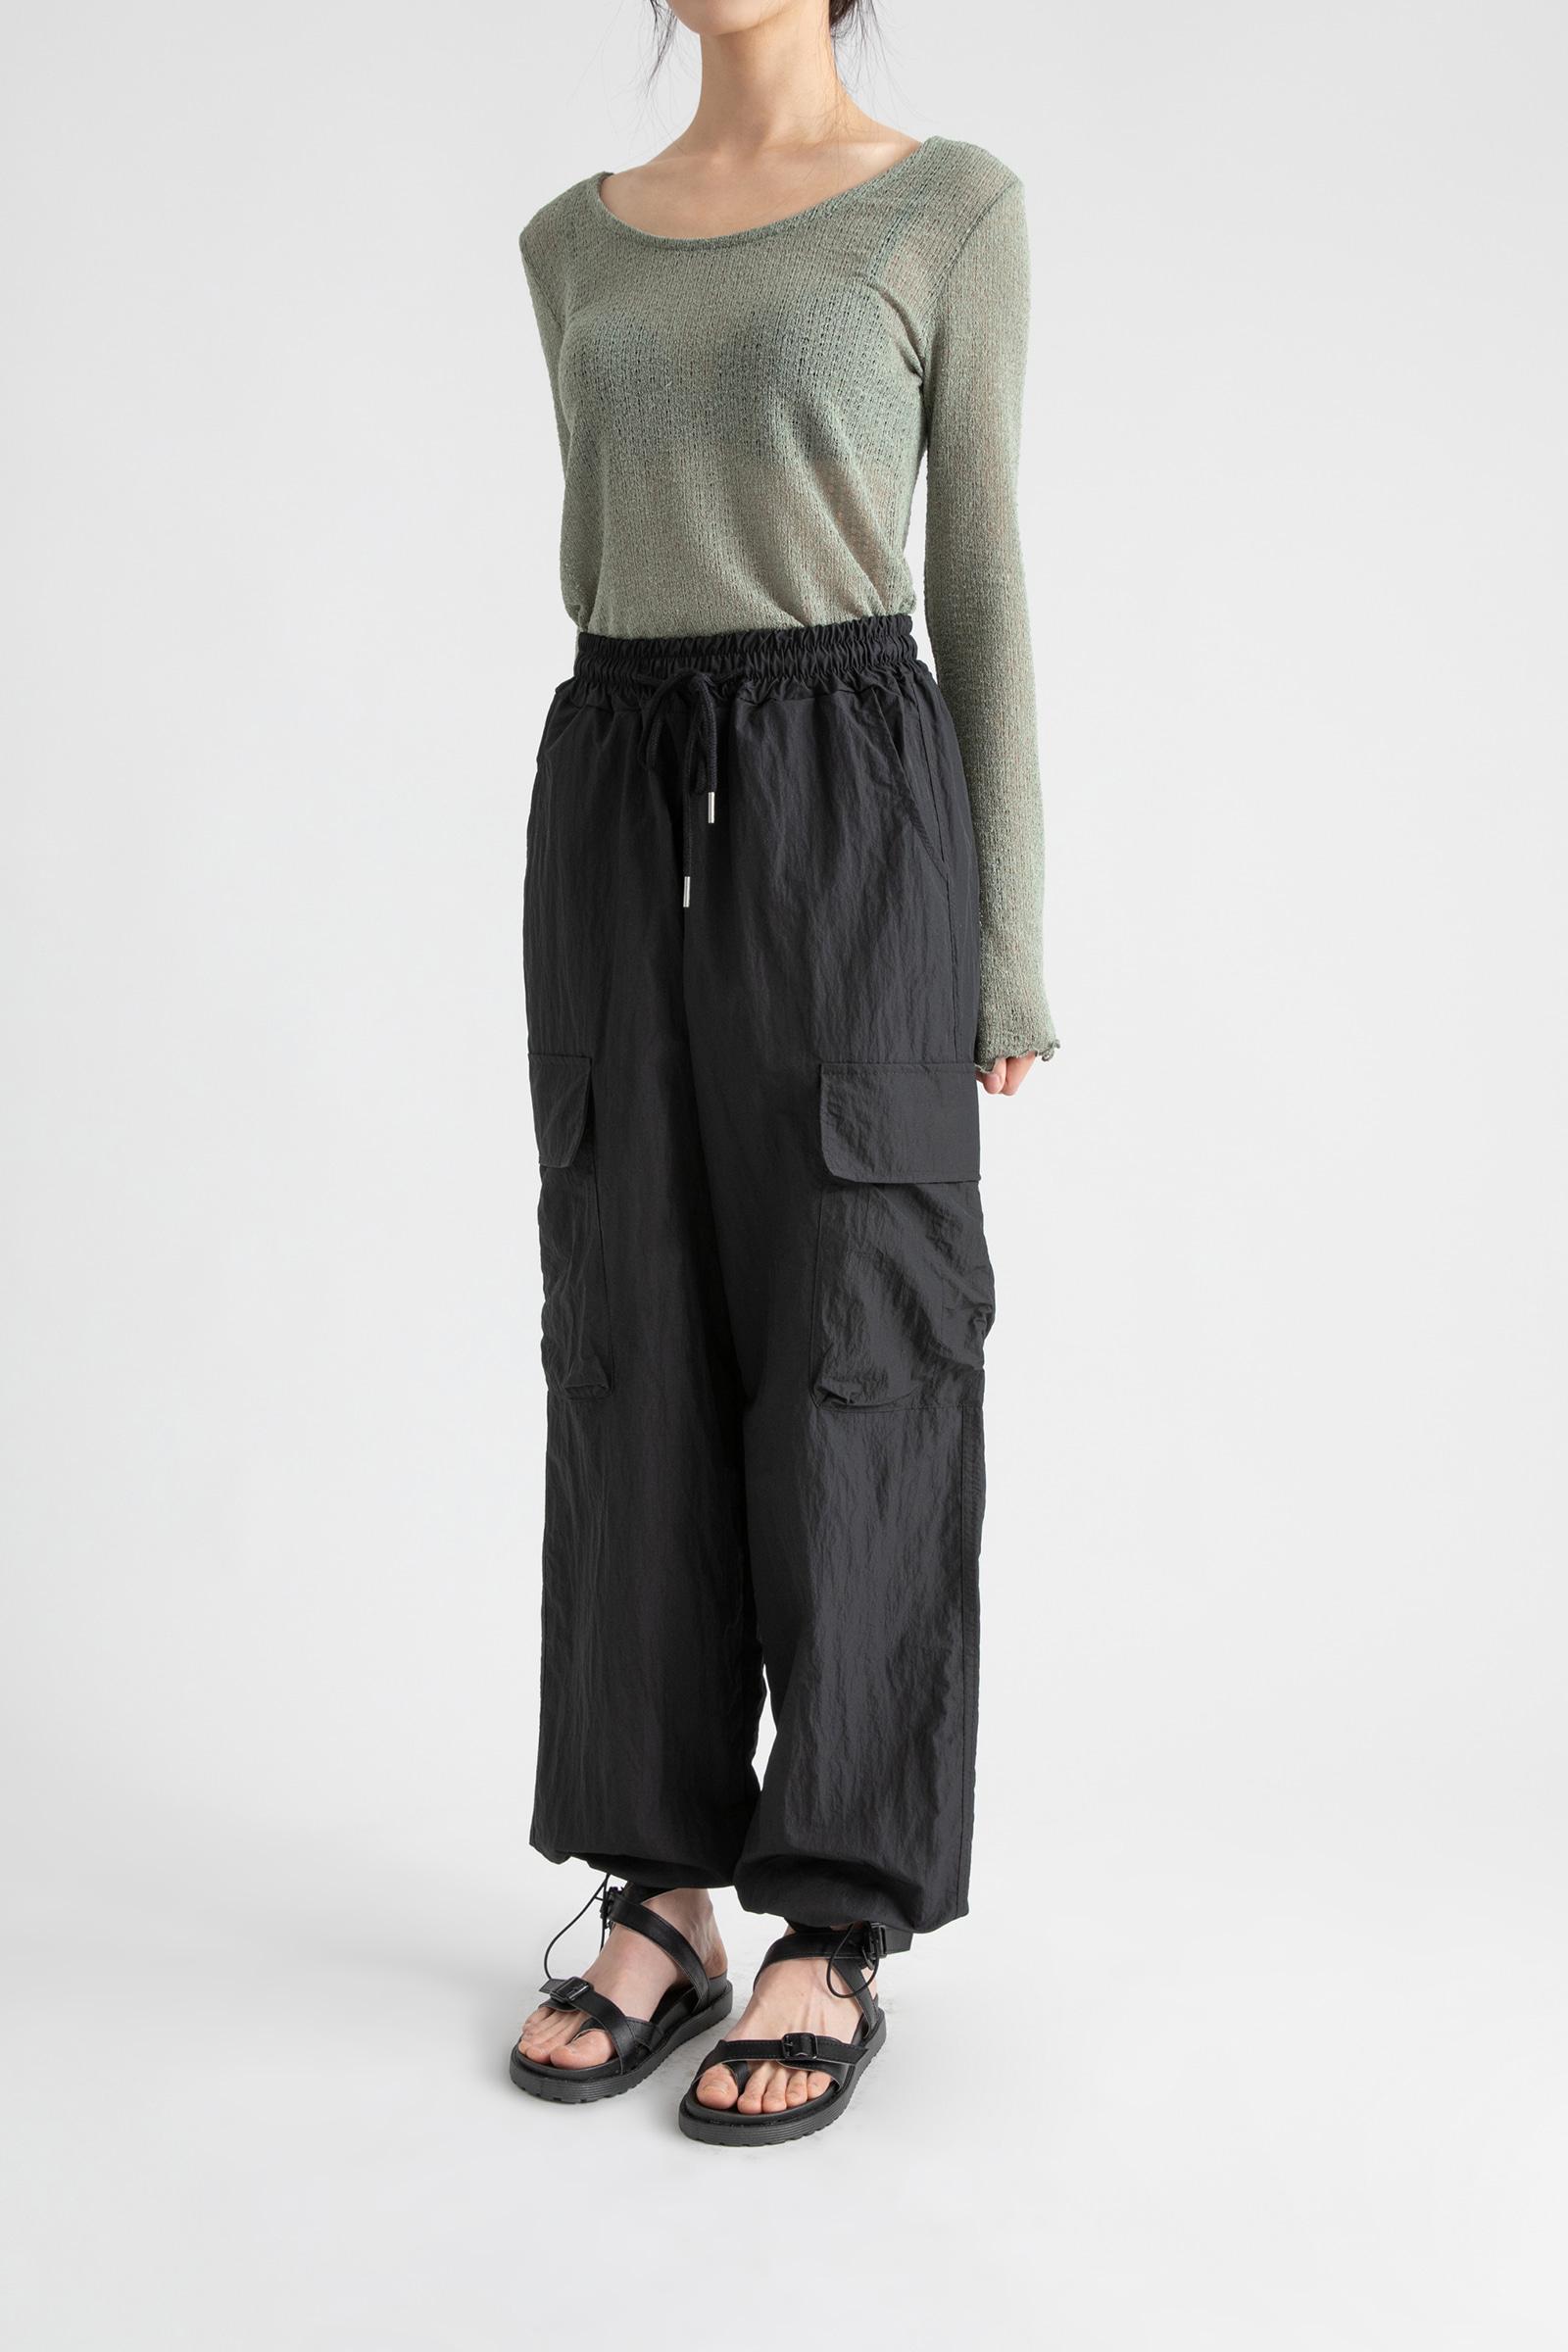 Unisex nylon jogger pants